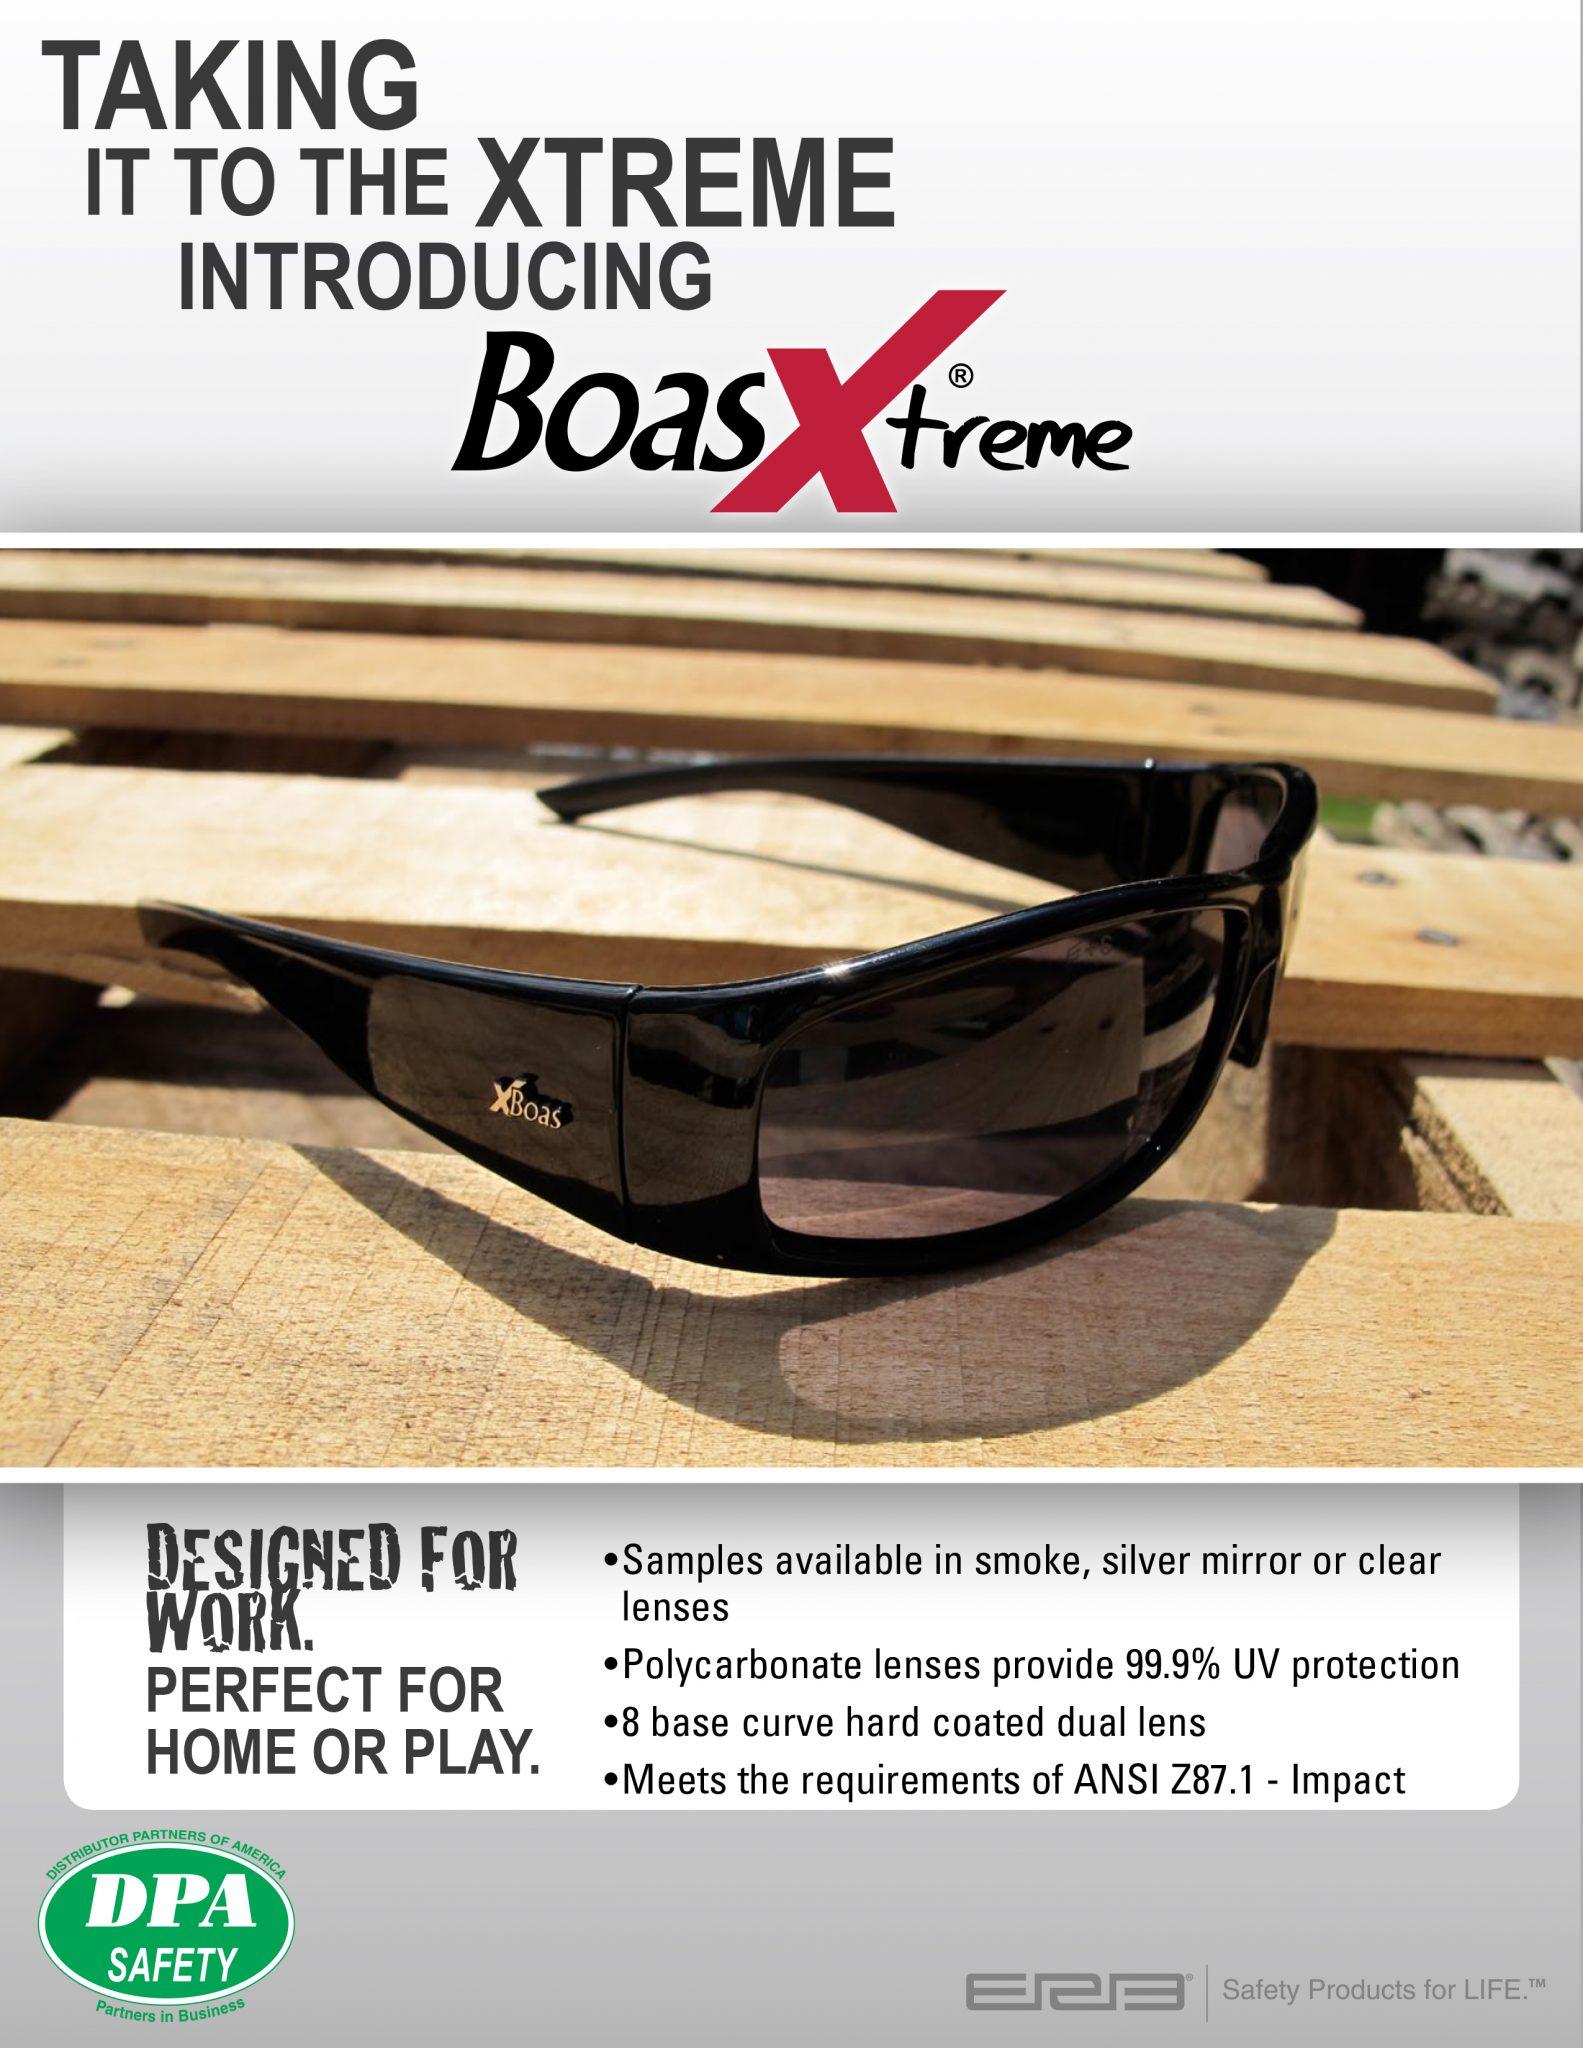 Xtreme_Boax-1 Small Business Online Marketing | Woodstock, GA